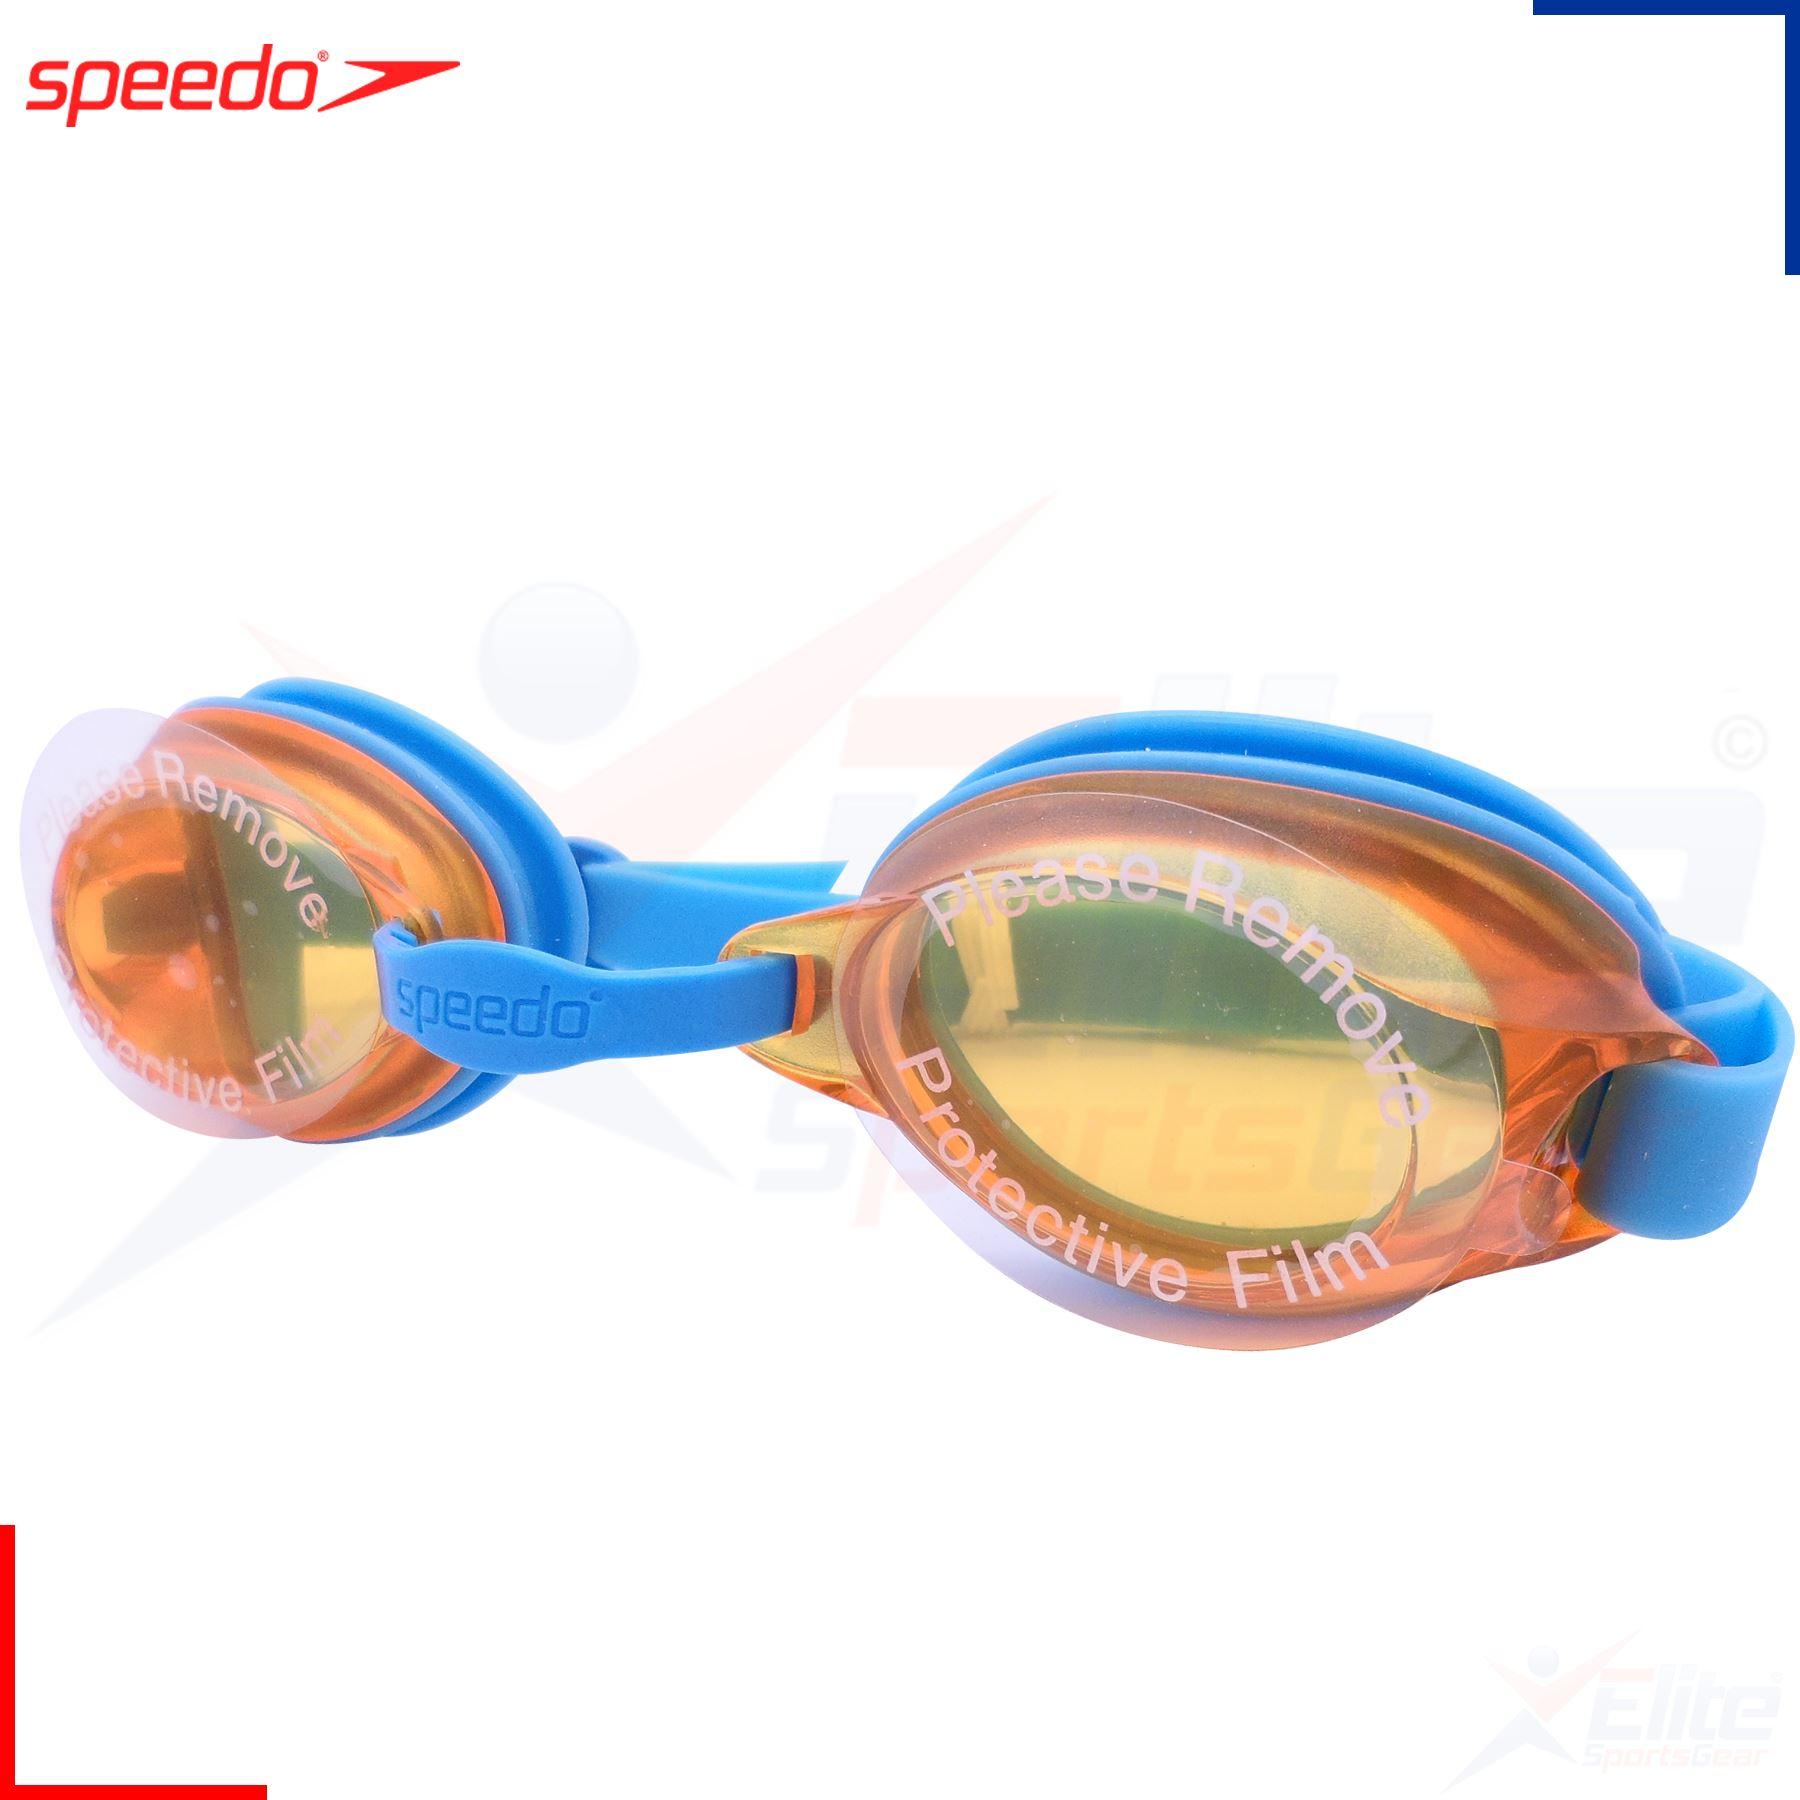 b371237ac01 Speedo Jet Junior Swimming Goggles - Boys Girls Childrens UV Anti-Fog Dive  Swim